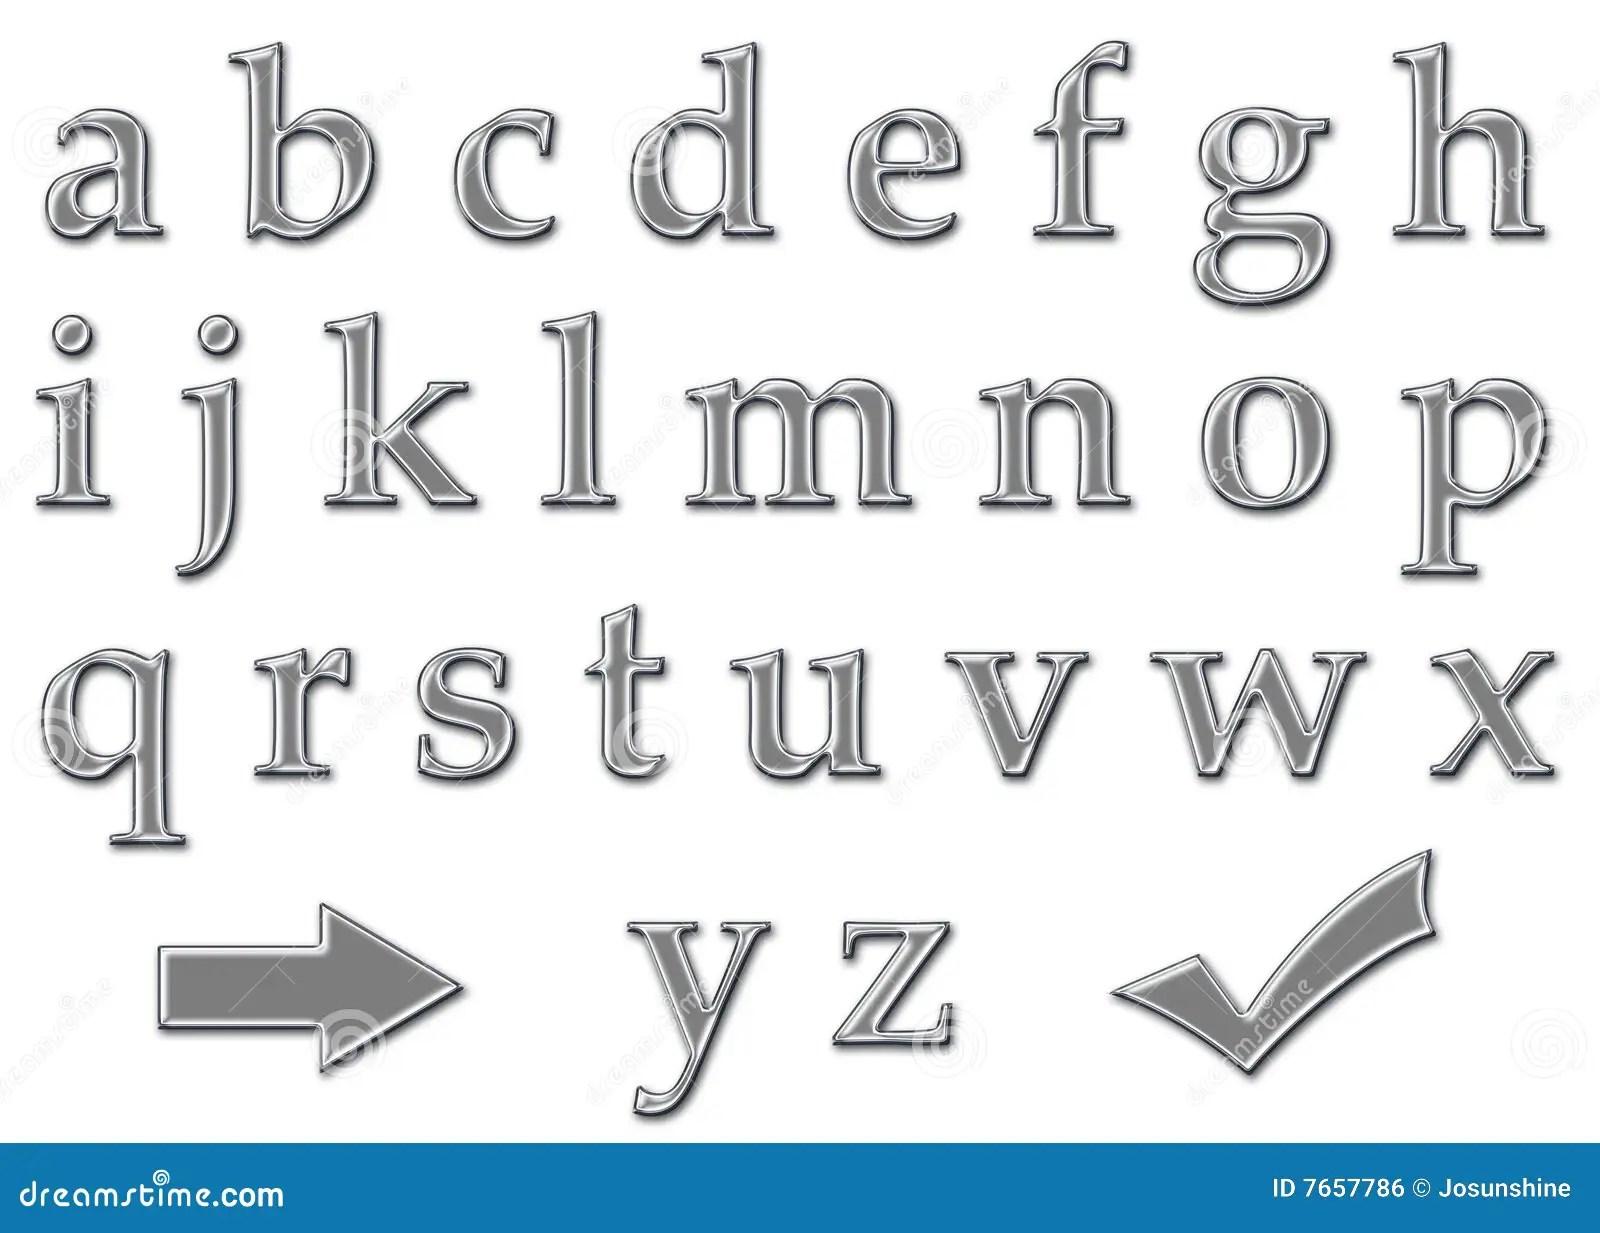 Chrome Letter Alphabet Lowercase Royalty Free Stock Image